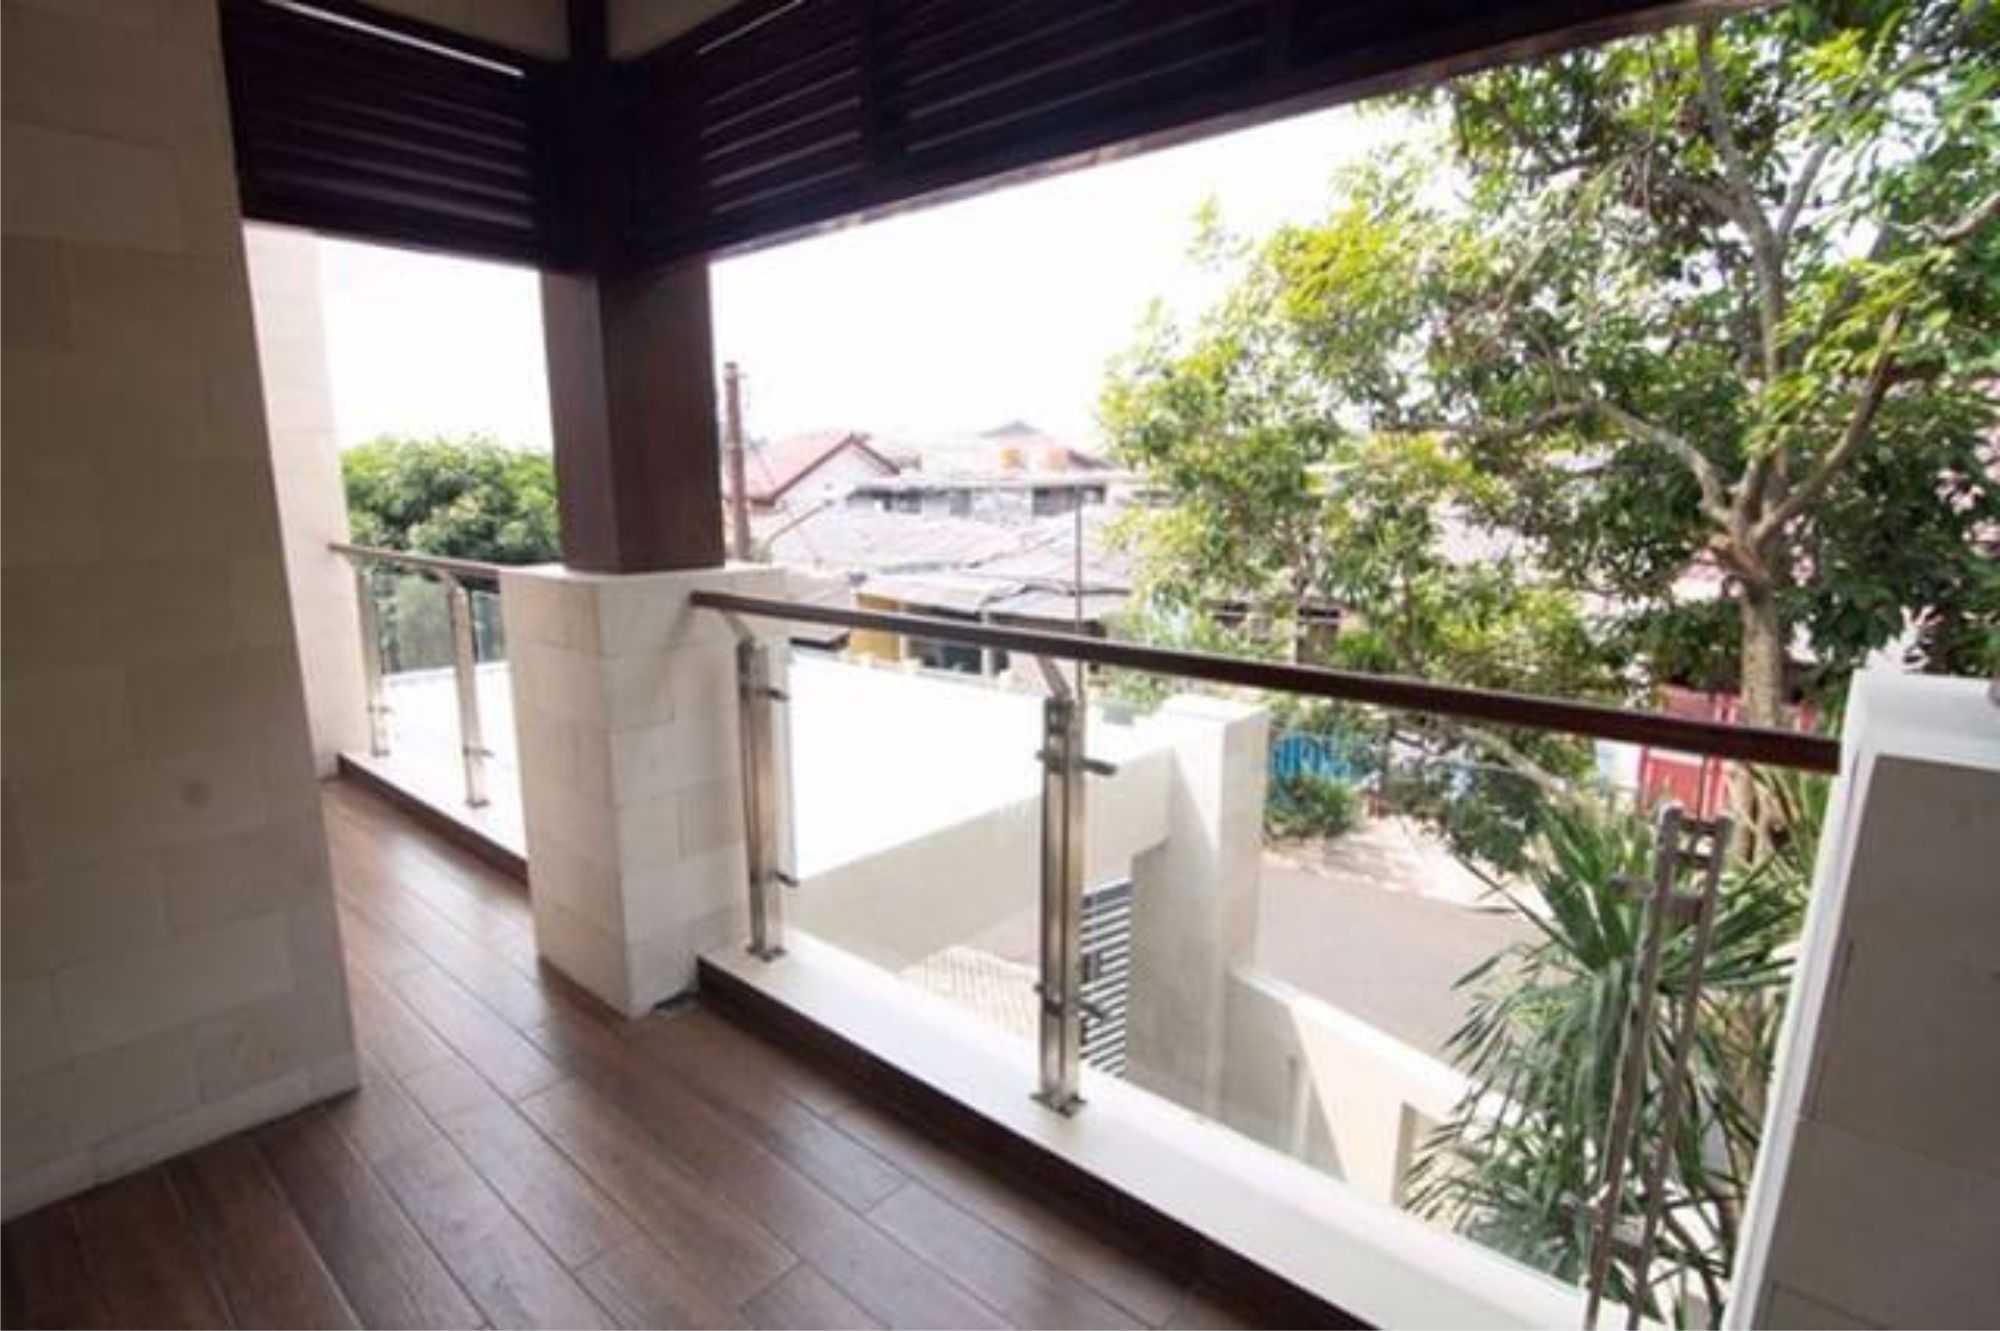 Emporio Architect Progress Konstruksi Rumah Villa Bali Tropis 385 @ Jakarta Jakarta, Daerah Khusus Ibukota Jakarta, Indonesia Jakarta, Daerah Khusus Ibukota Jakarta, Indonesia Emporio-Architect-Progress-Konstruksi-Rumah-Villa-Bali-Tropis-385-Jakarta   76588